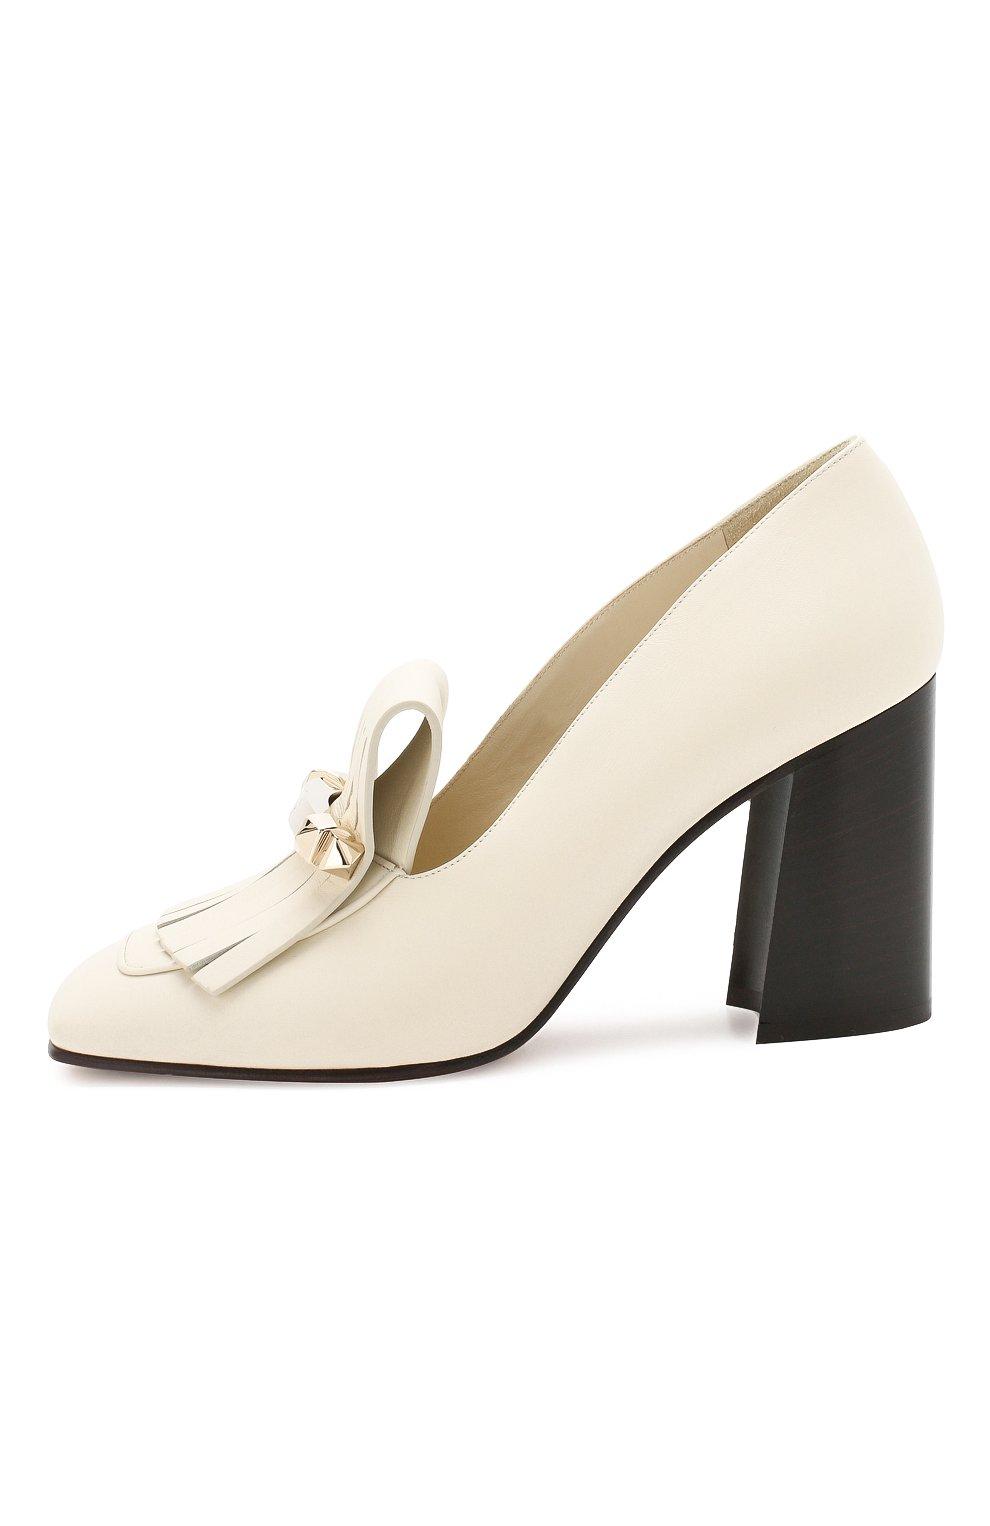 Кожаные туфли Valentino Garavani Uptown Valentino белые   Фото №3